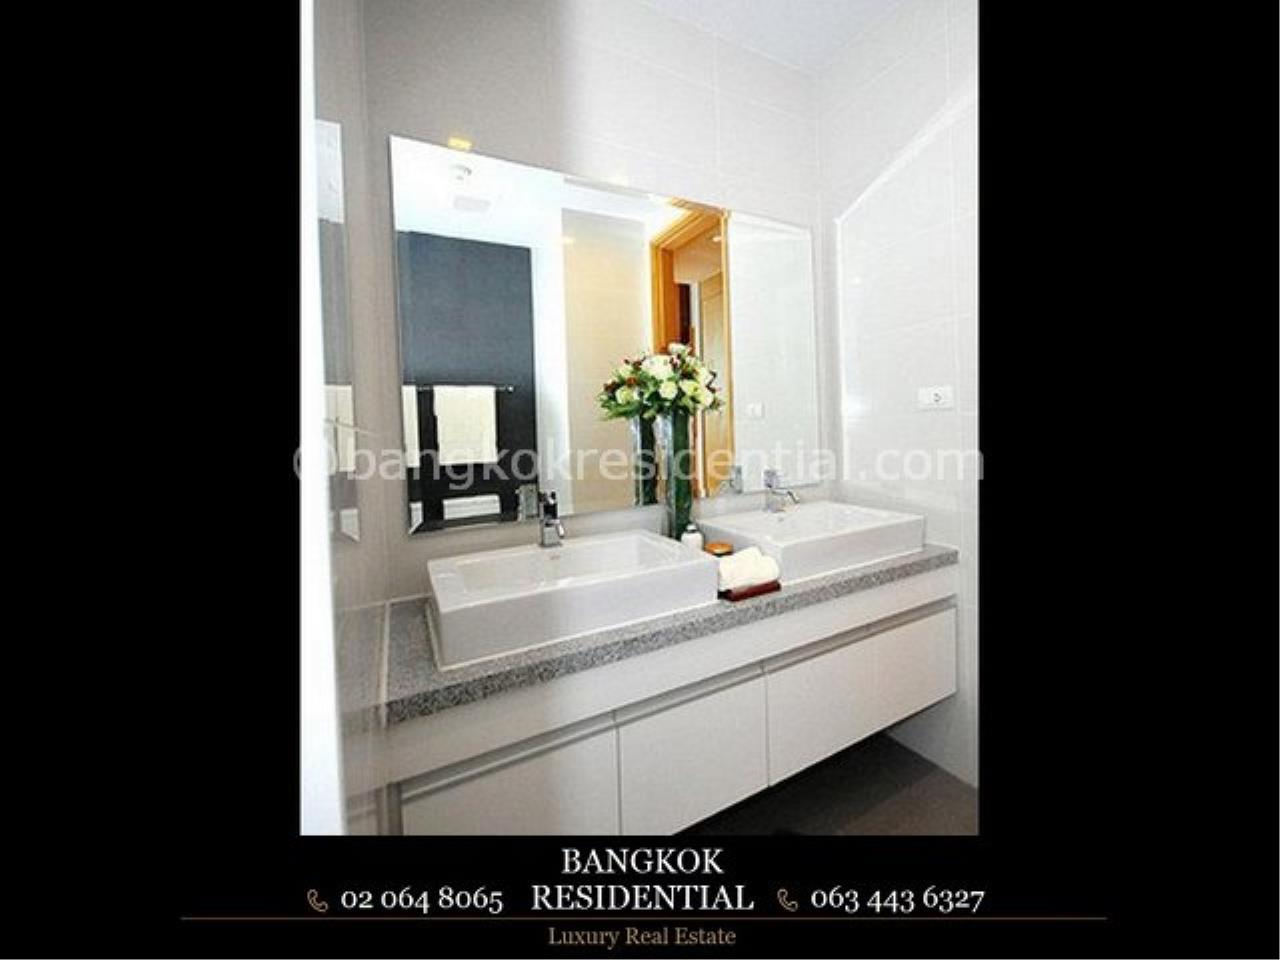 Bangkok Residential Agency's 2BR Millennium Residence For Sale Or Rent (BR1641CD) 9